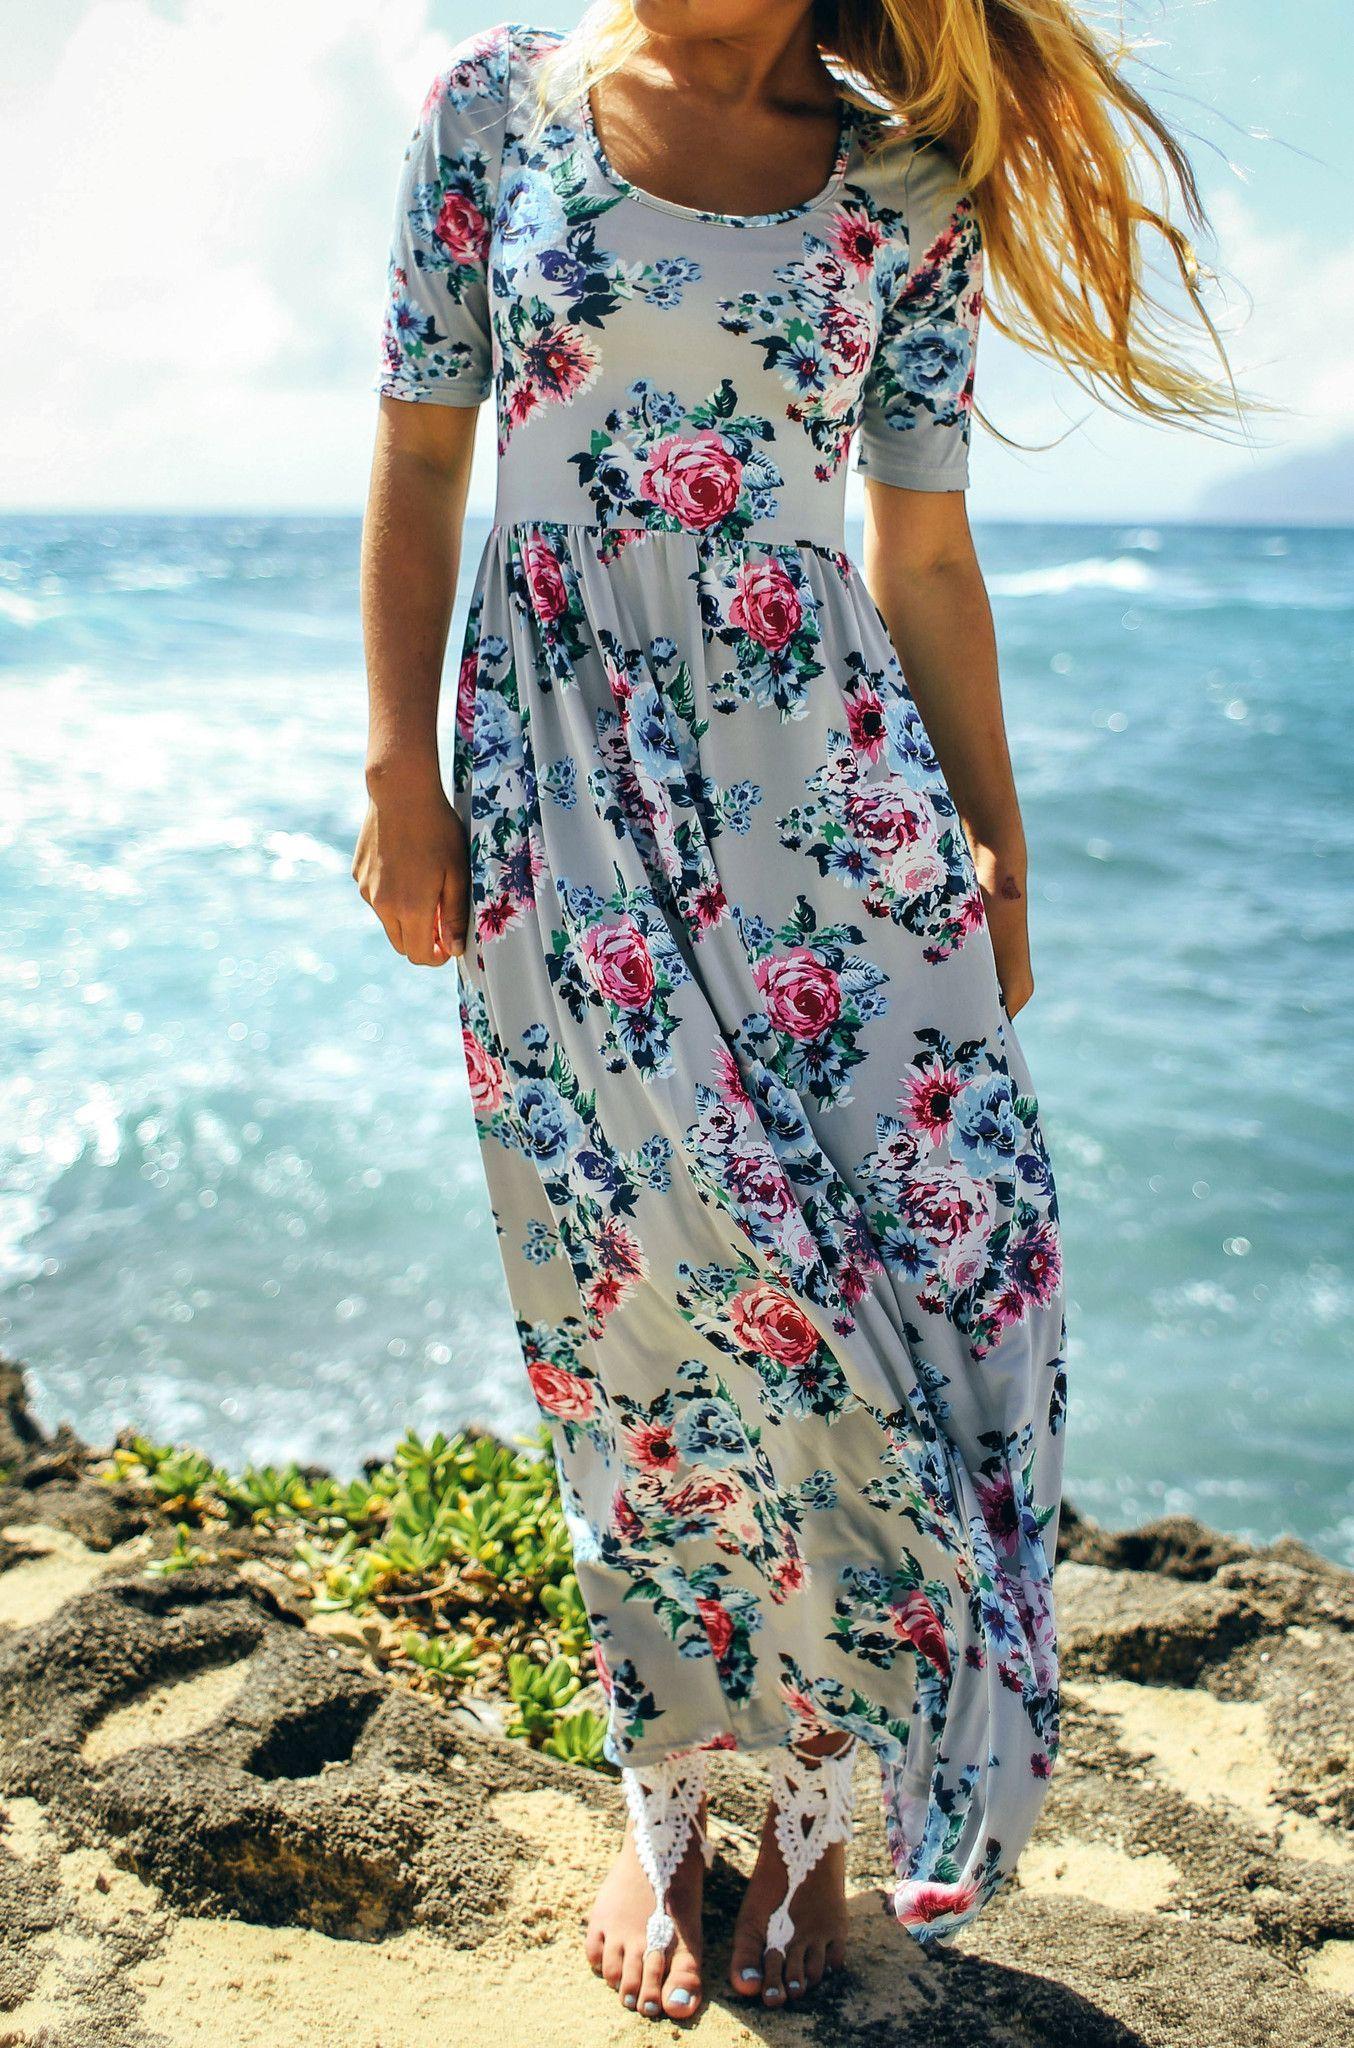 846f9631c6ef4 Floral Maxi Dress: Gray | Making Money Online | Floral maxi dress ...